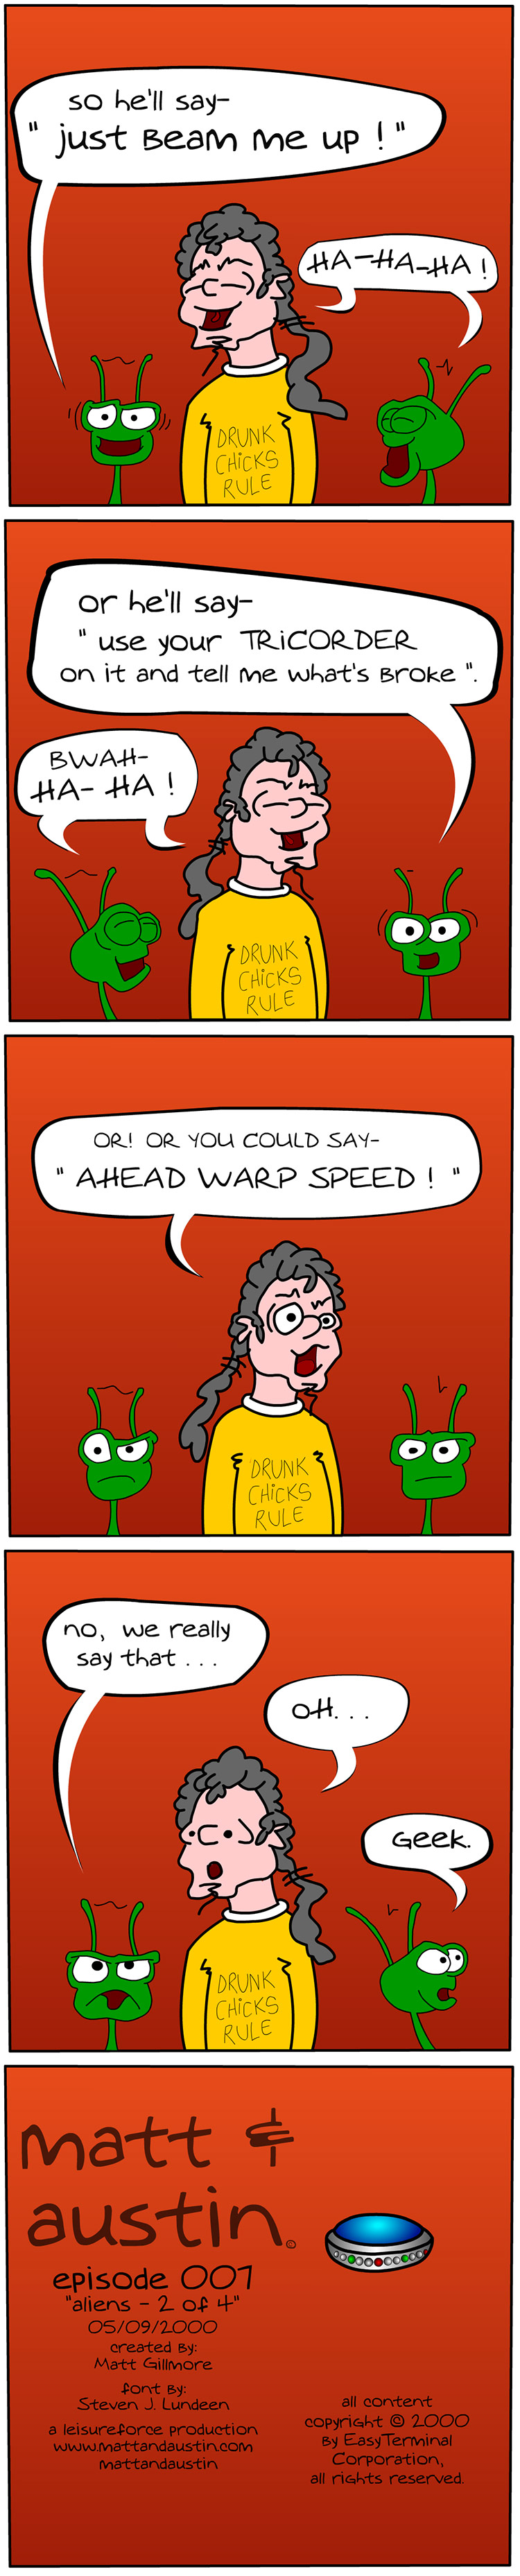 Webcomic the Matt and Austin Comic Strip 007 Aliens 2 of 4